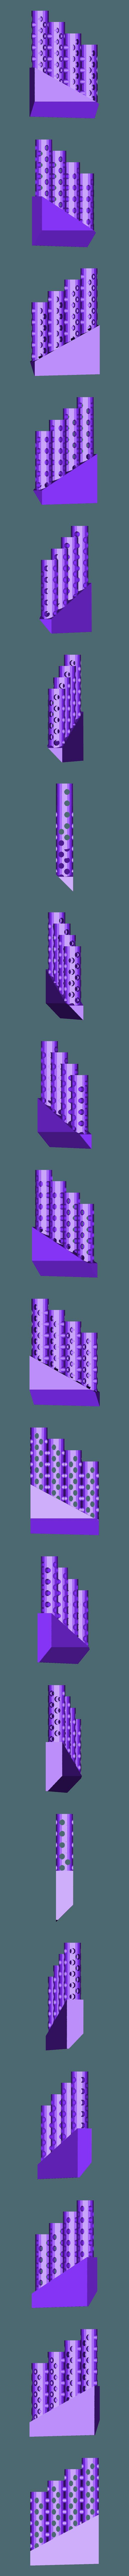 Quad_Ex_Pipes_L.stl Download free STL file Gaslands Greebles (Blowers and Burners) • Design to 3D print, Ellie_Valkyrie